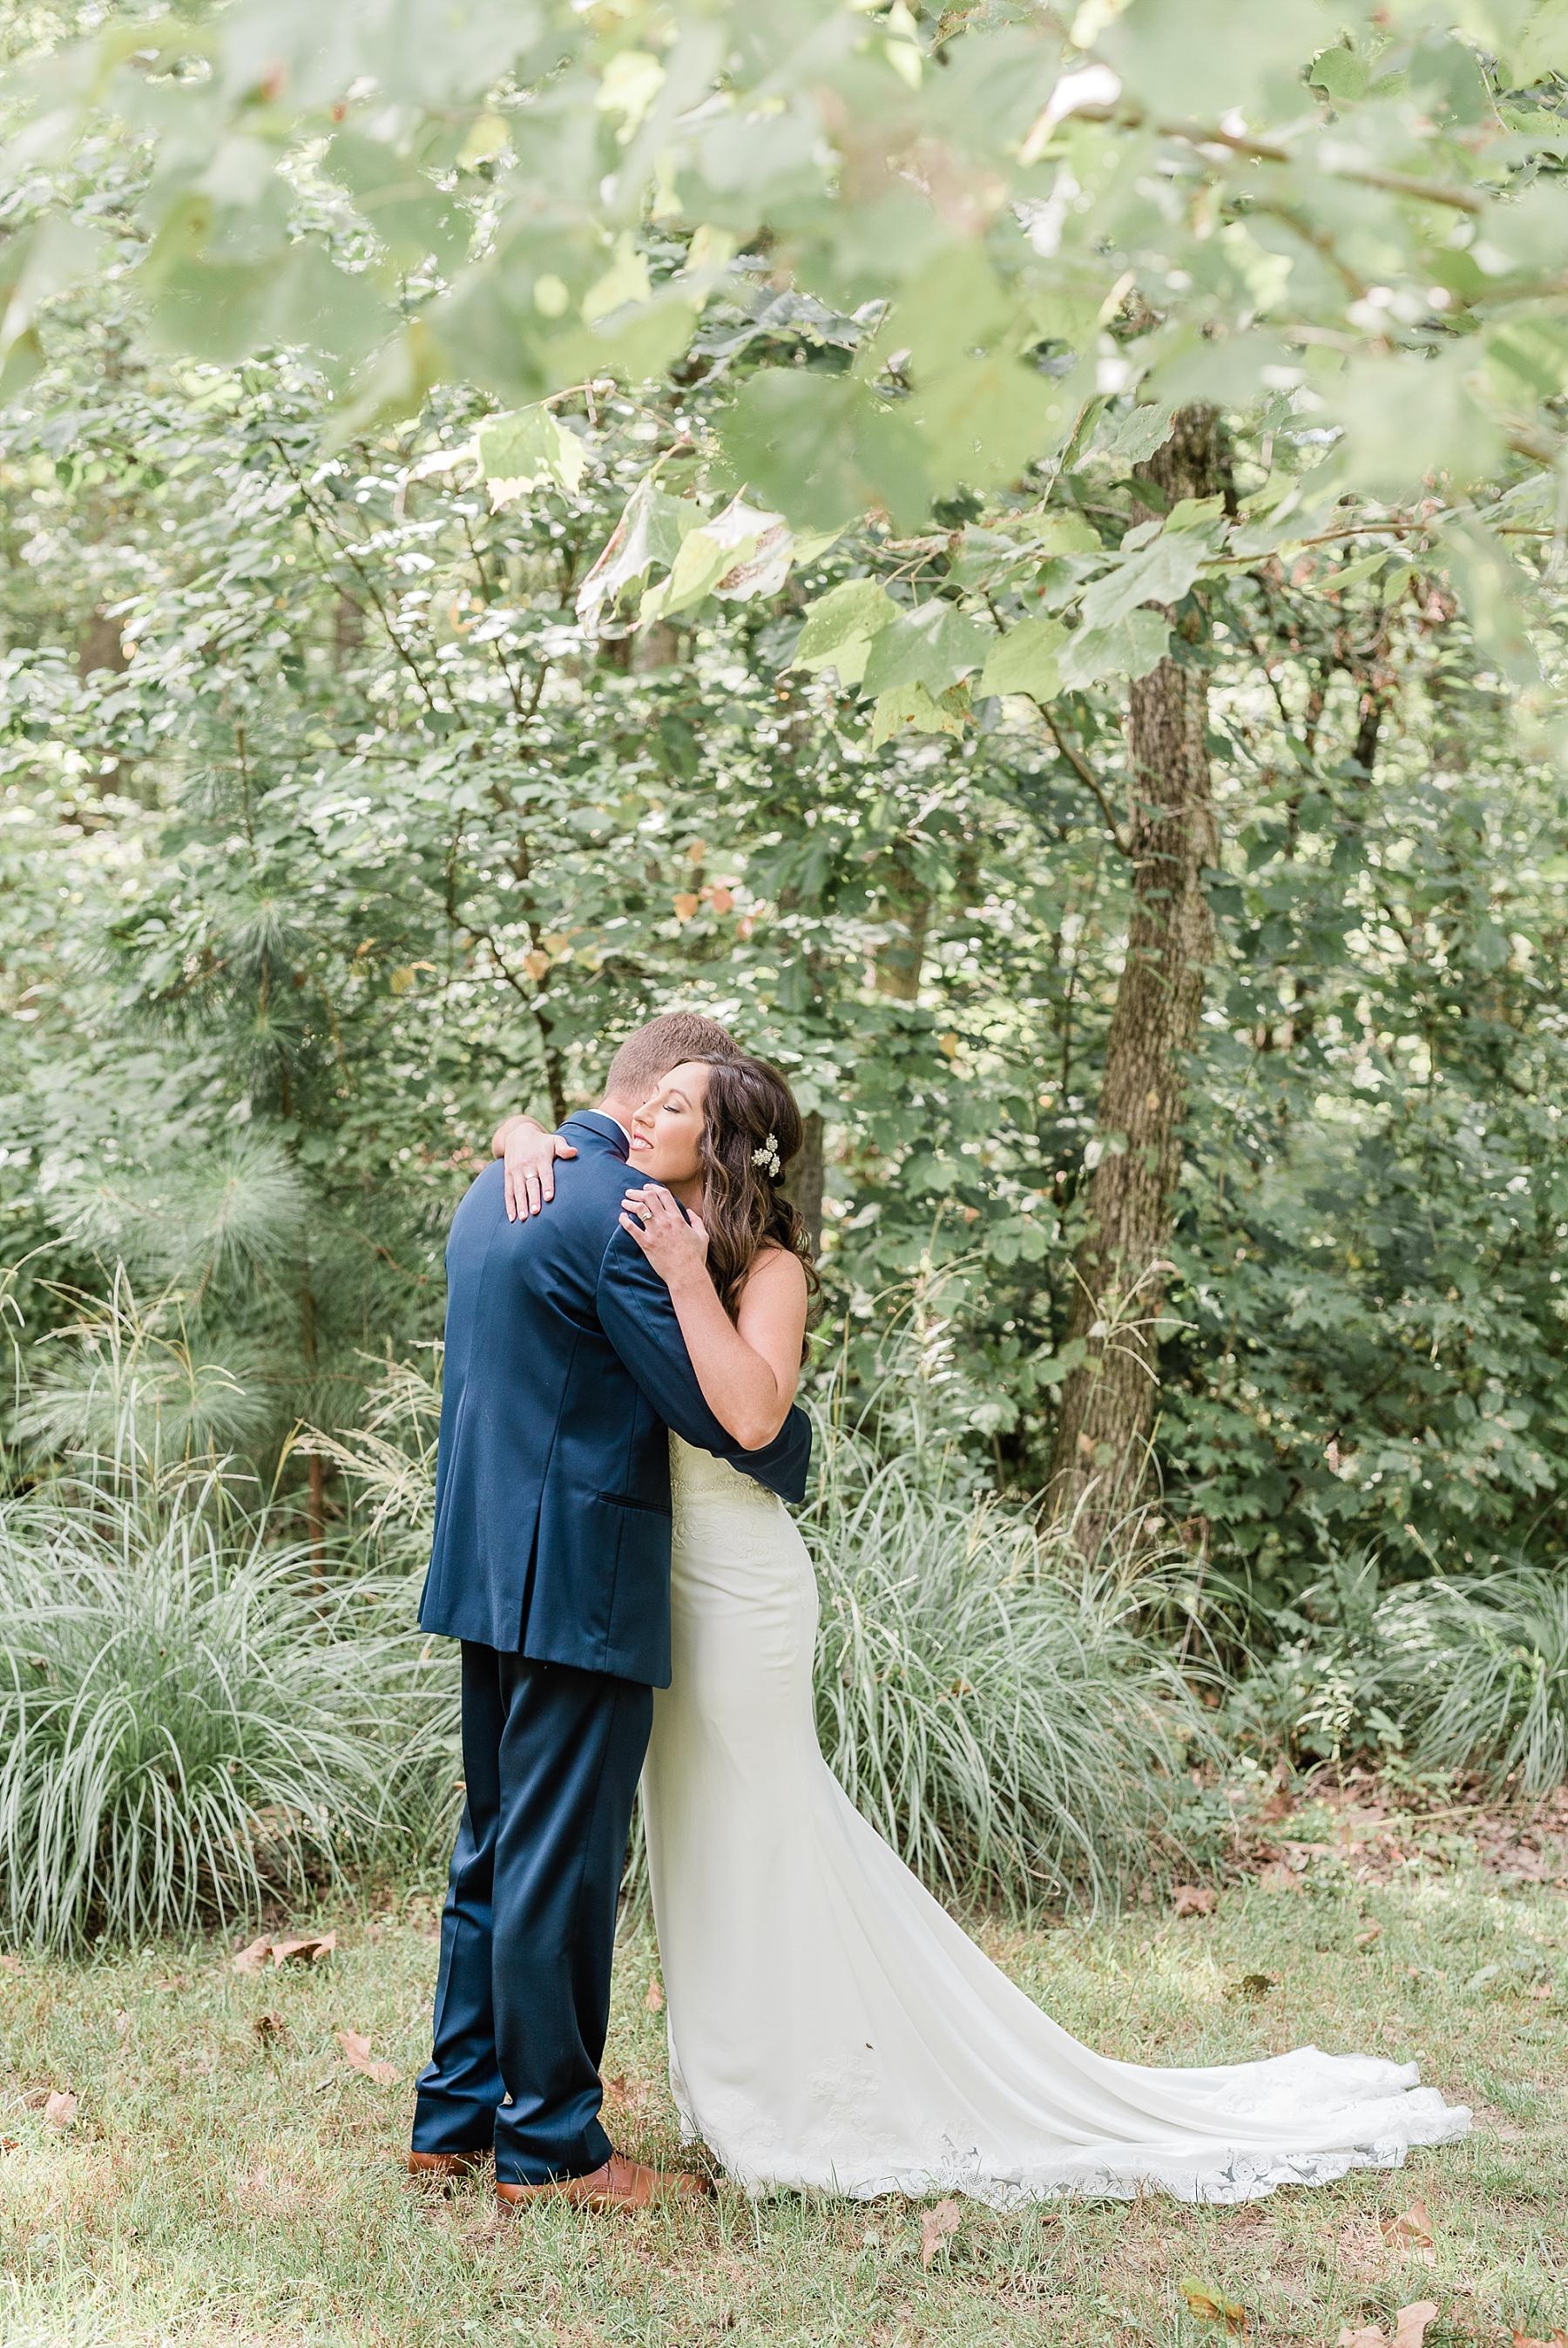 Romantic Summer Sunset Wedding Ceremony at Little Piney Lodge St. Louis Missouri by Kelsi Kliethermes Photography Fine Art Photographer_0032.jpg